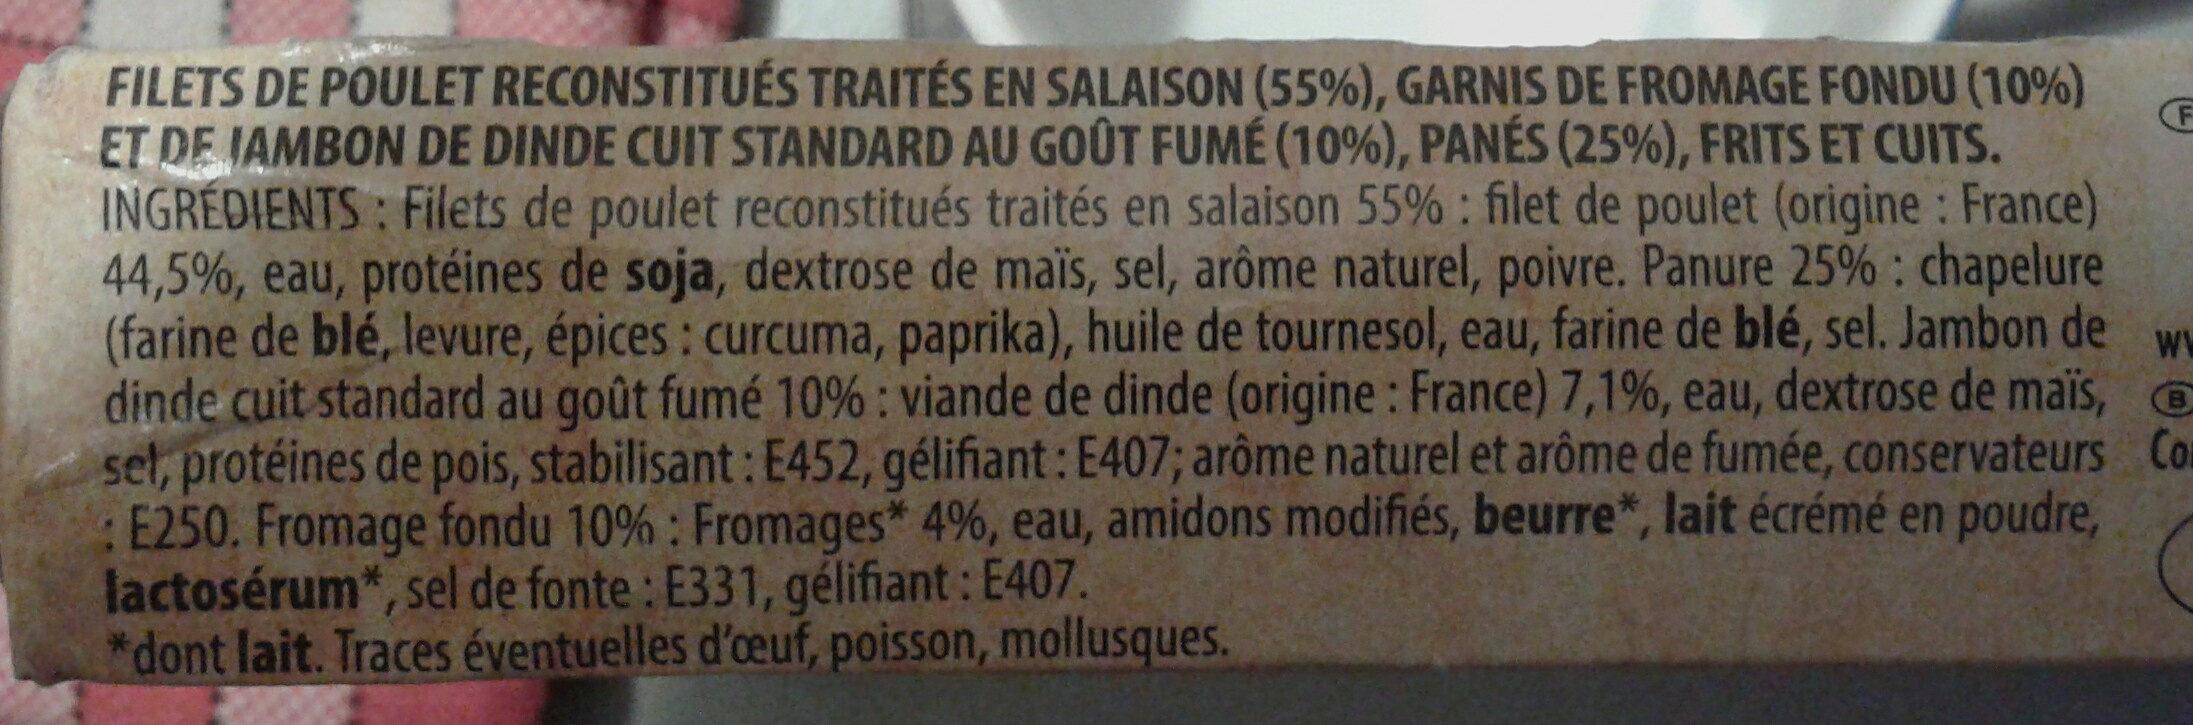 Escalope cordon bleu - Ingredients - fr